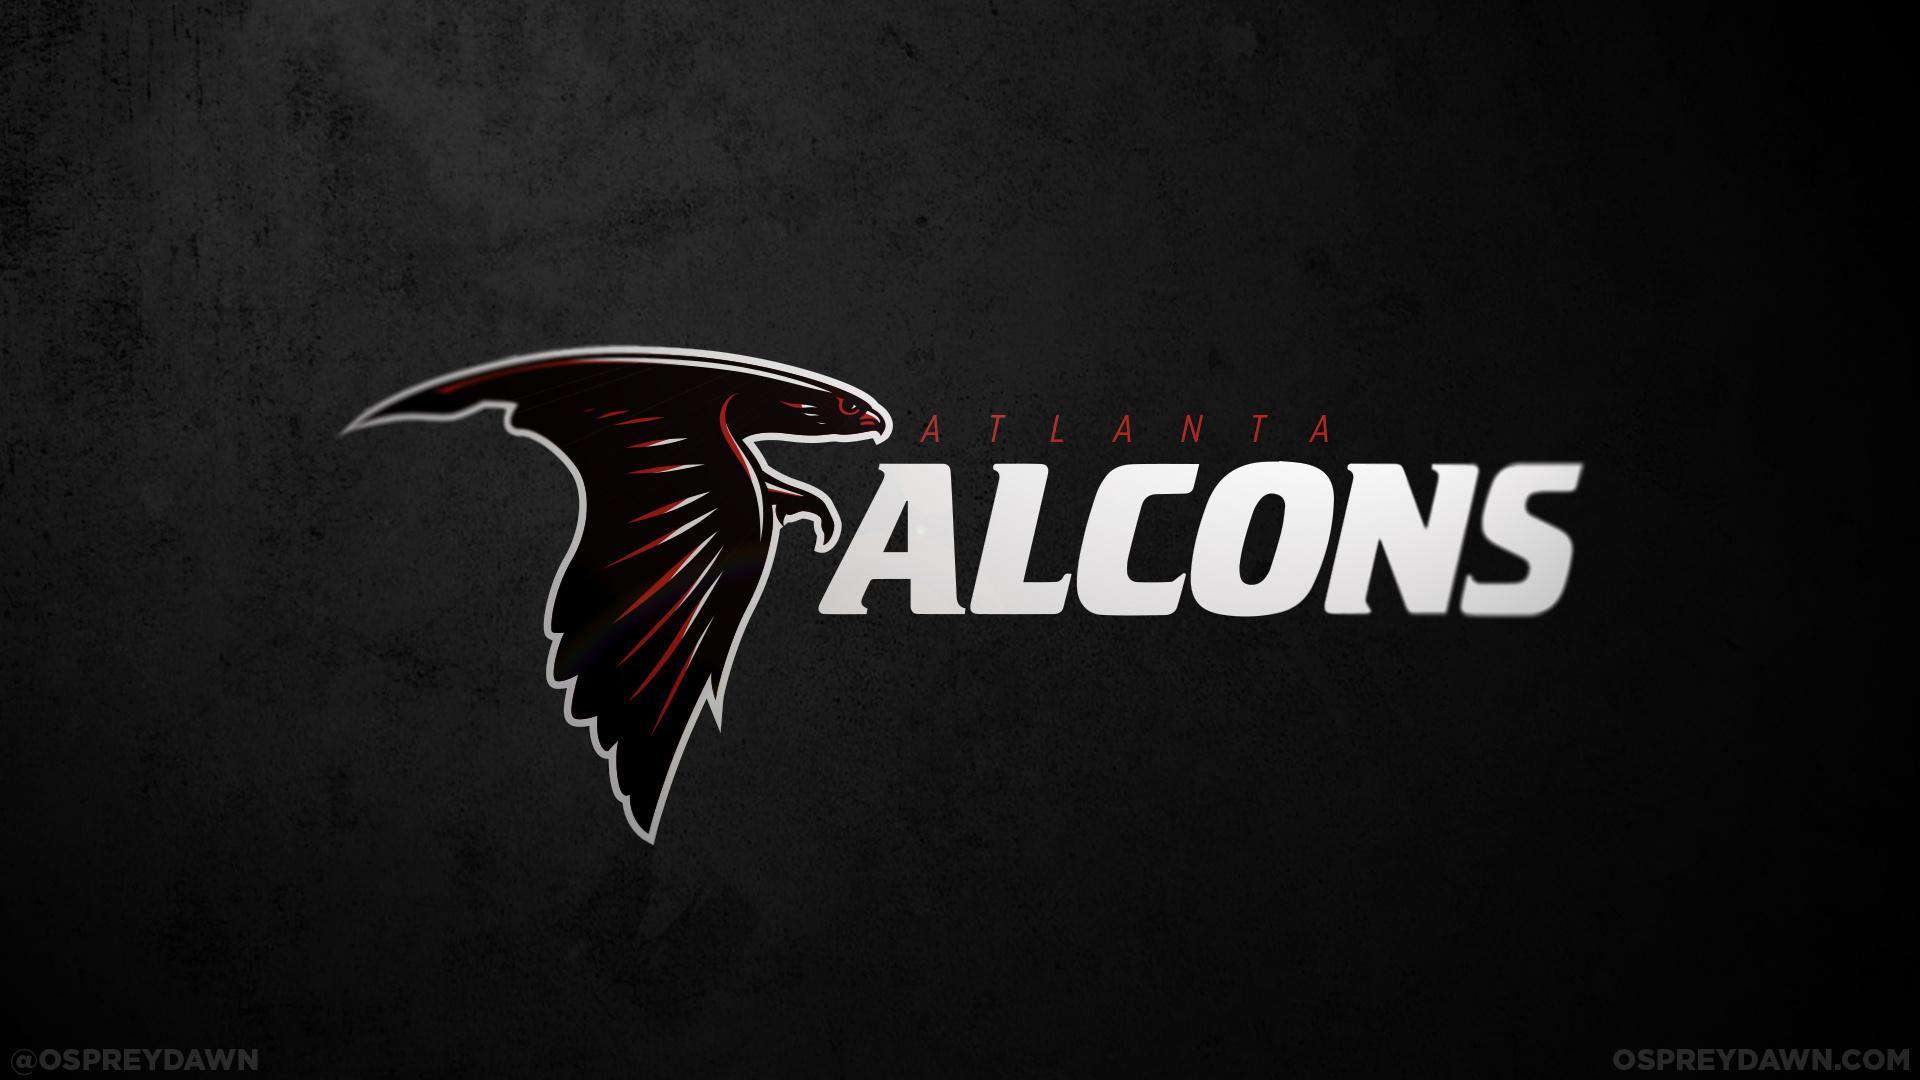 Atlanta Falcons Wallpaper Download Free Cool Full Hd: Atlanta Falcon Wallpapers (39 Wallpapers)